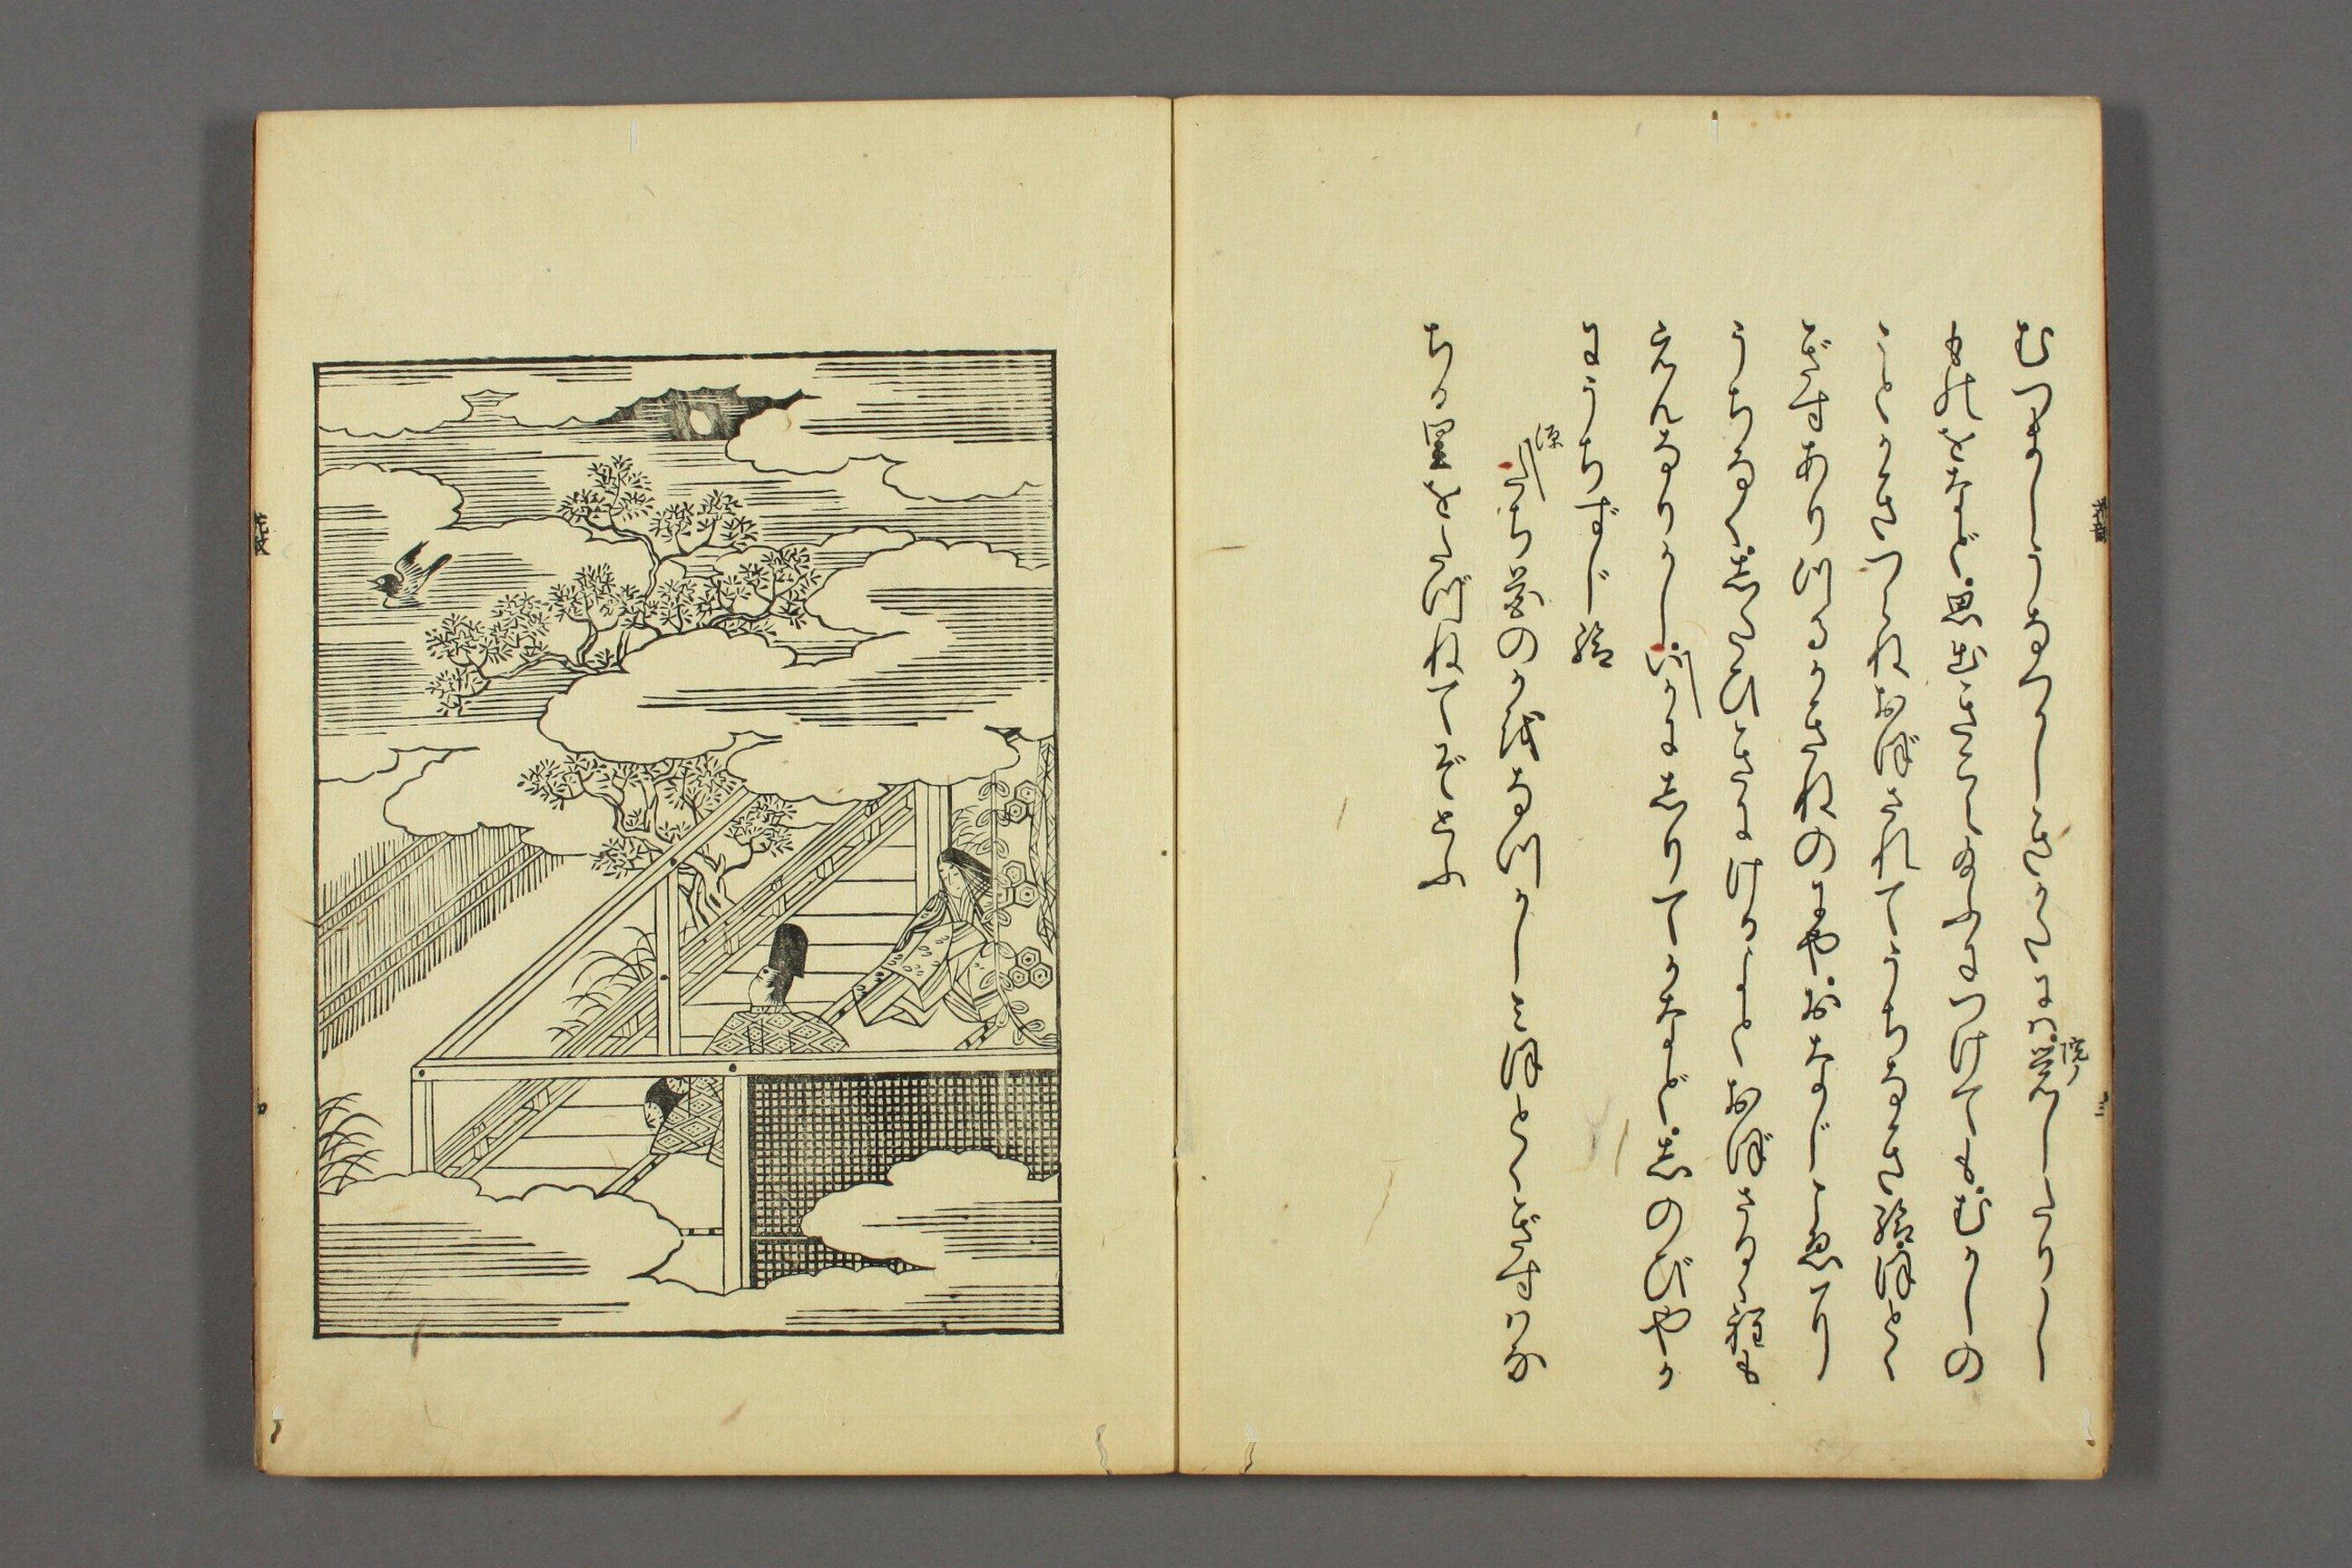 http://archive.wul.waseda.ac.jp/kosho/bunko30/bunko30_a0007/bunko30_a0007_0011/bunko30_a0007_0011_p0005.jpg